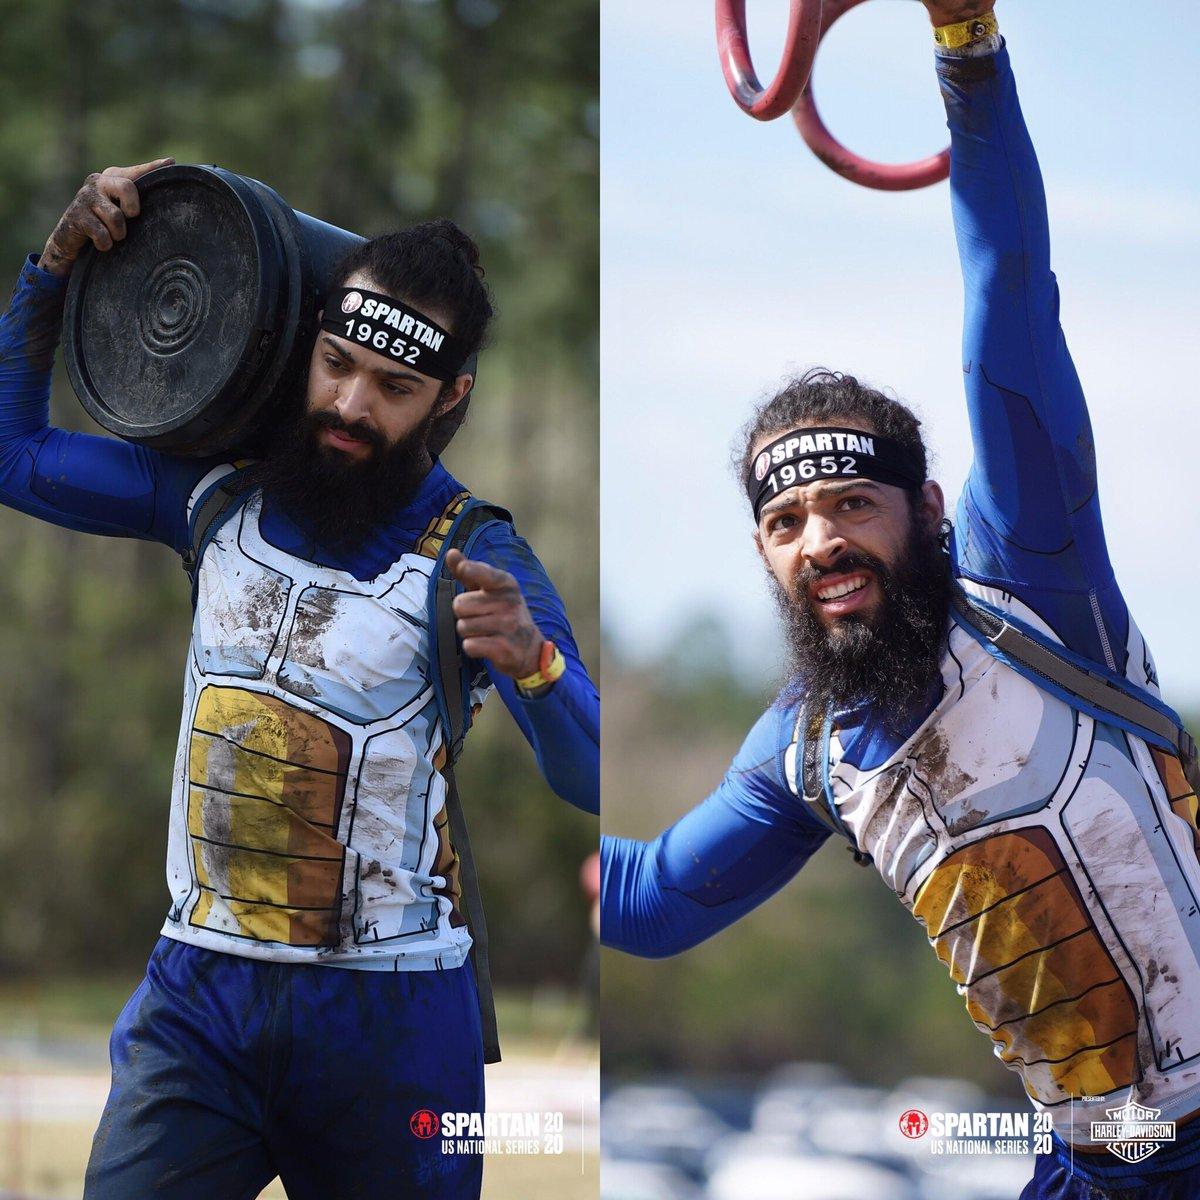 Loving my photos from #SpartanRace Super and Sprint this last weekend!   #iam1stphorm #1stphorm #legionofboom #1stphormathletesearch #bethe1 #wedothework #duespaid #HeroTrainer #MyFitDecisions #Spartan #JustSaiyanGearpic.twitter.com/7WpwZ6mXlf